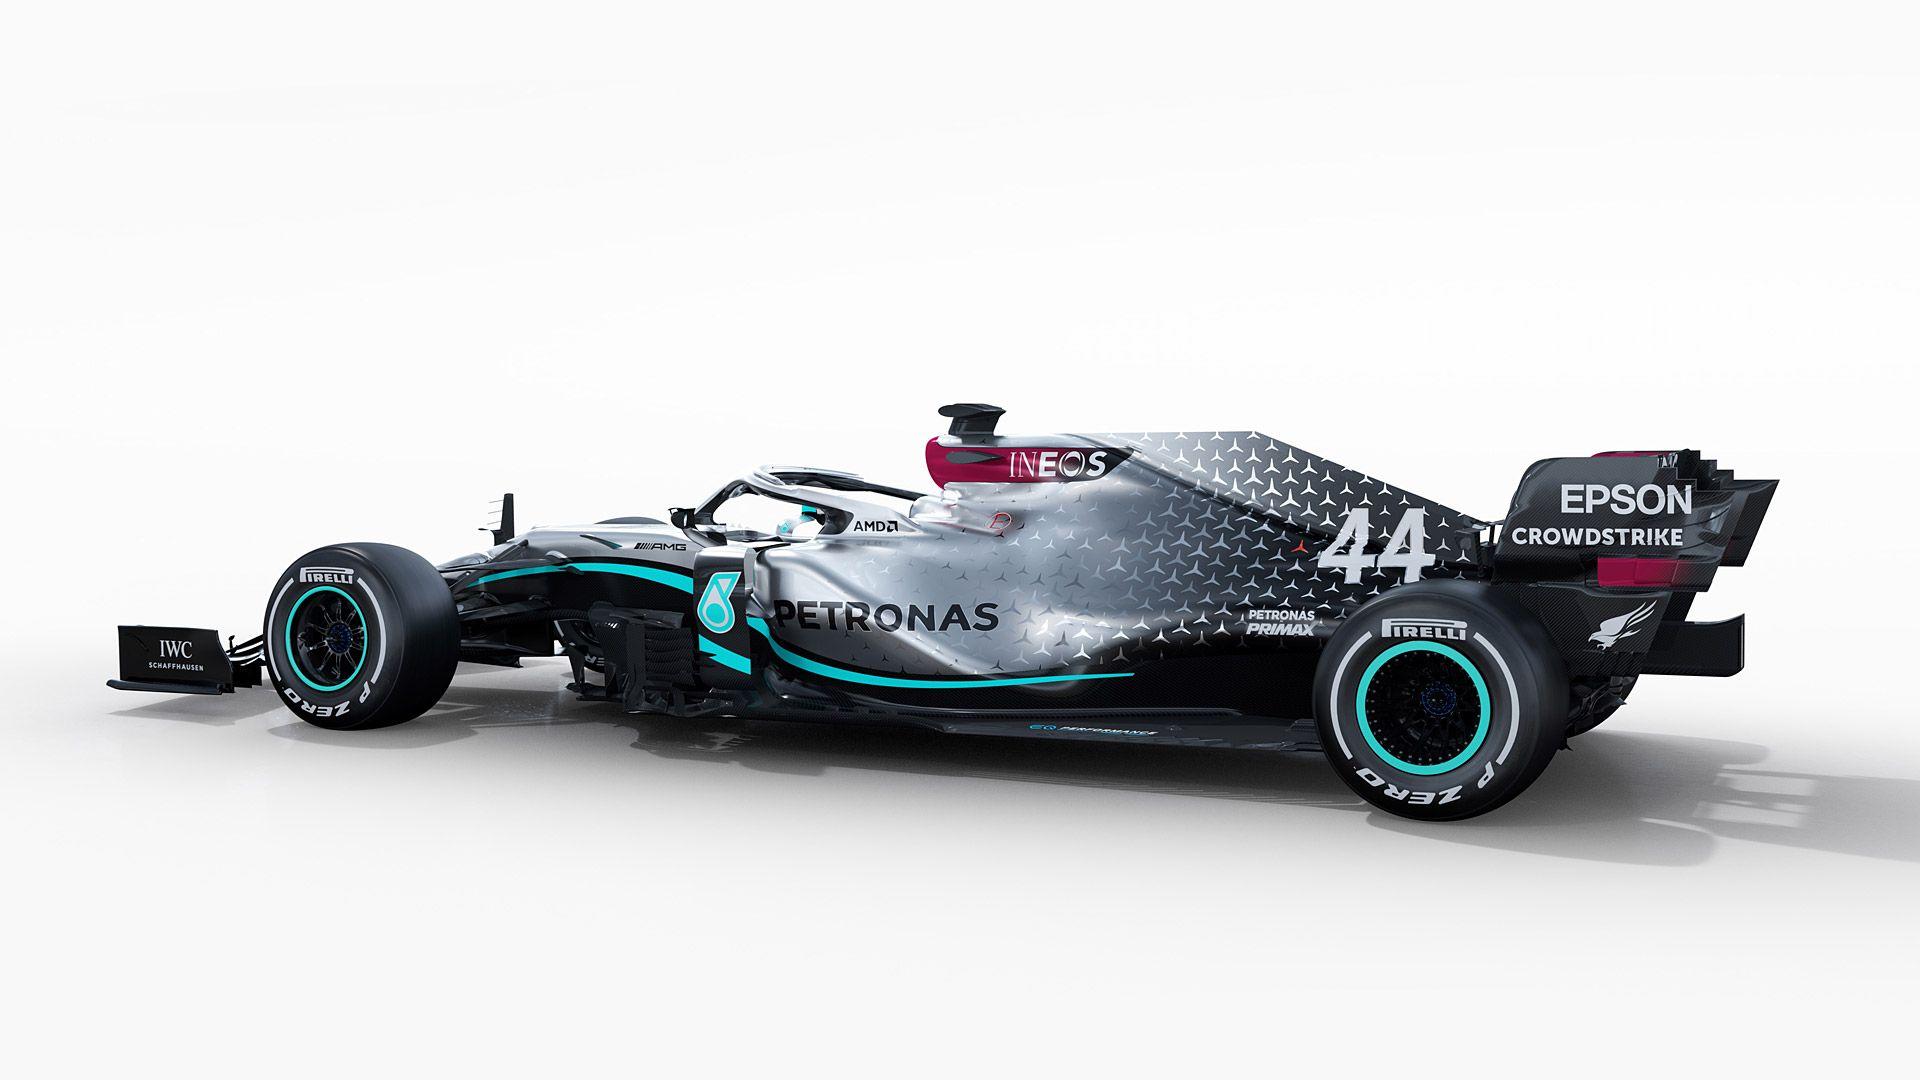 Mercedes Amg F1 W11 Eq Performance Hd Wallpapers Wallpaper Cave